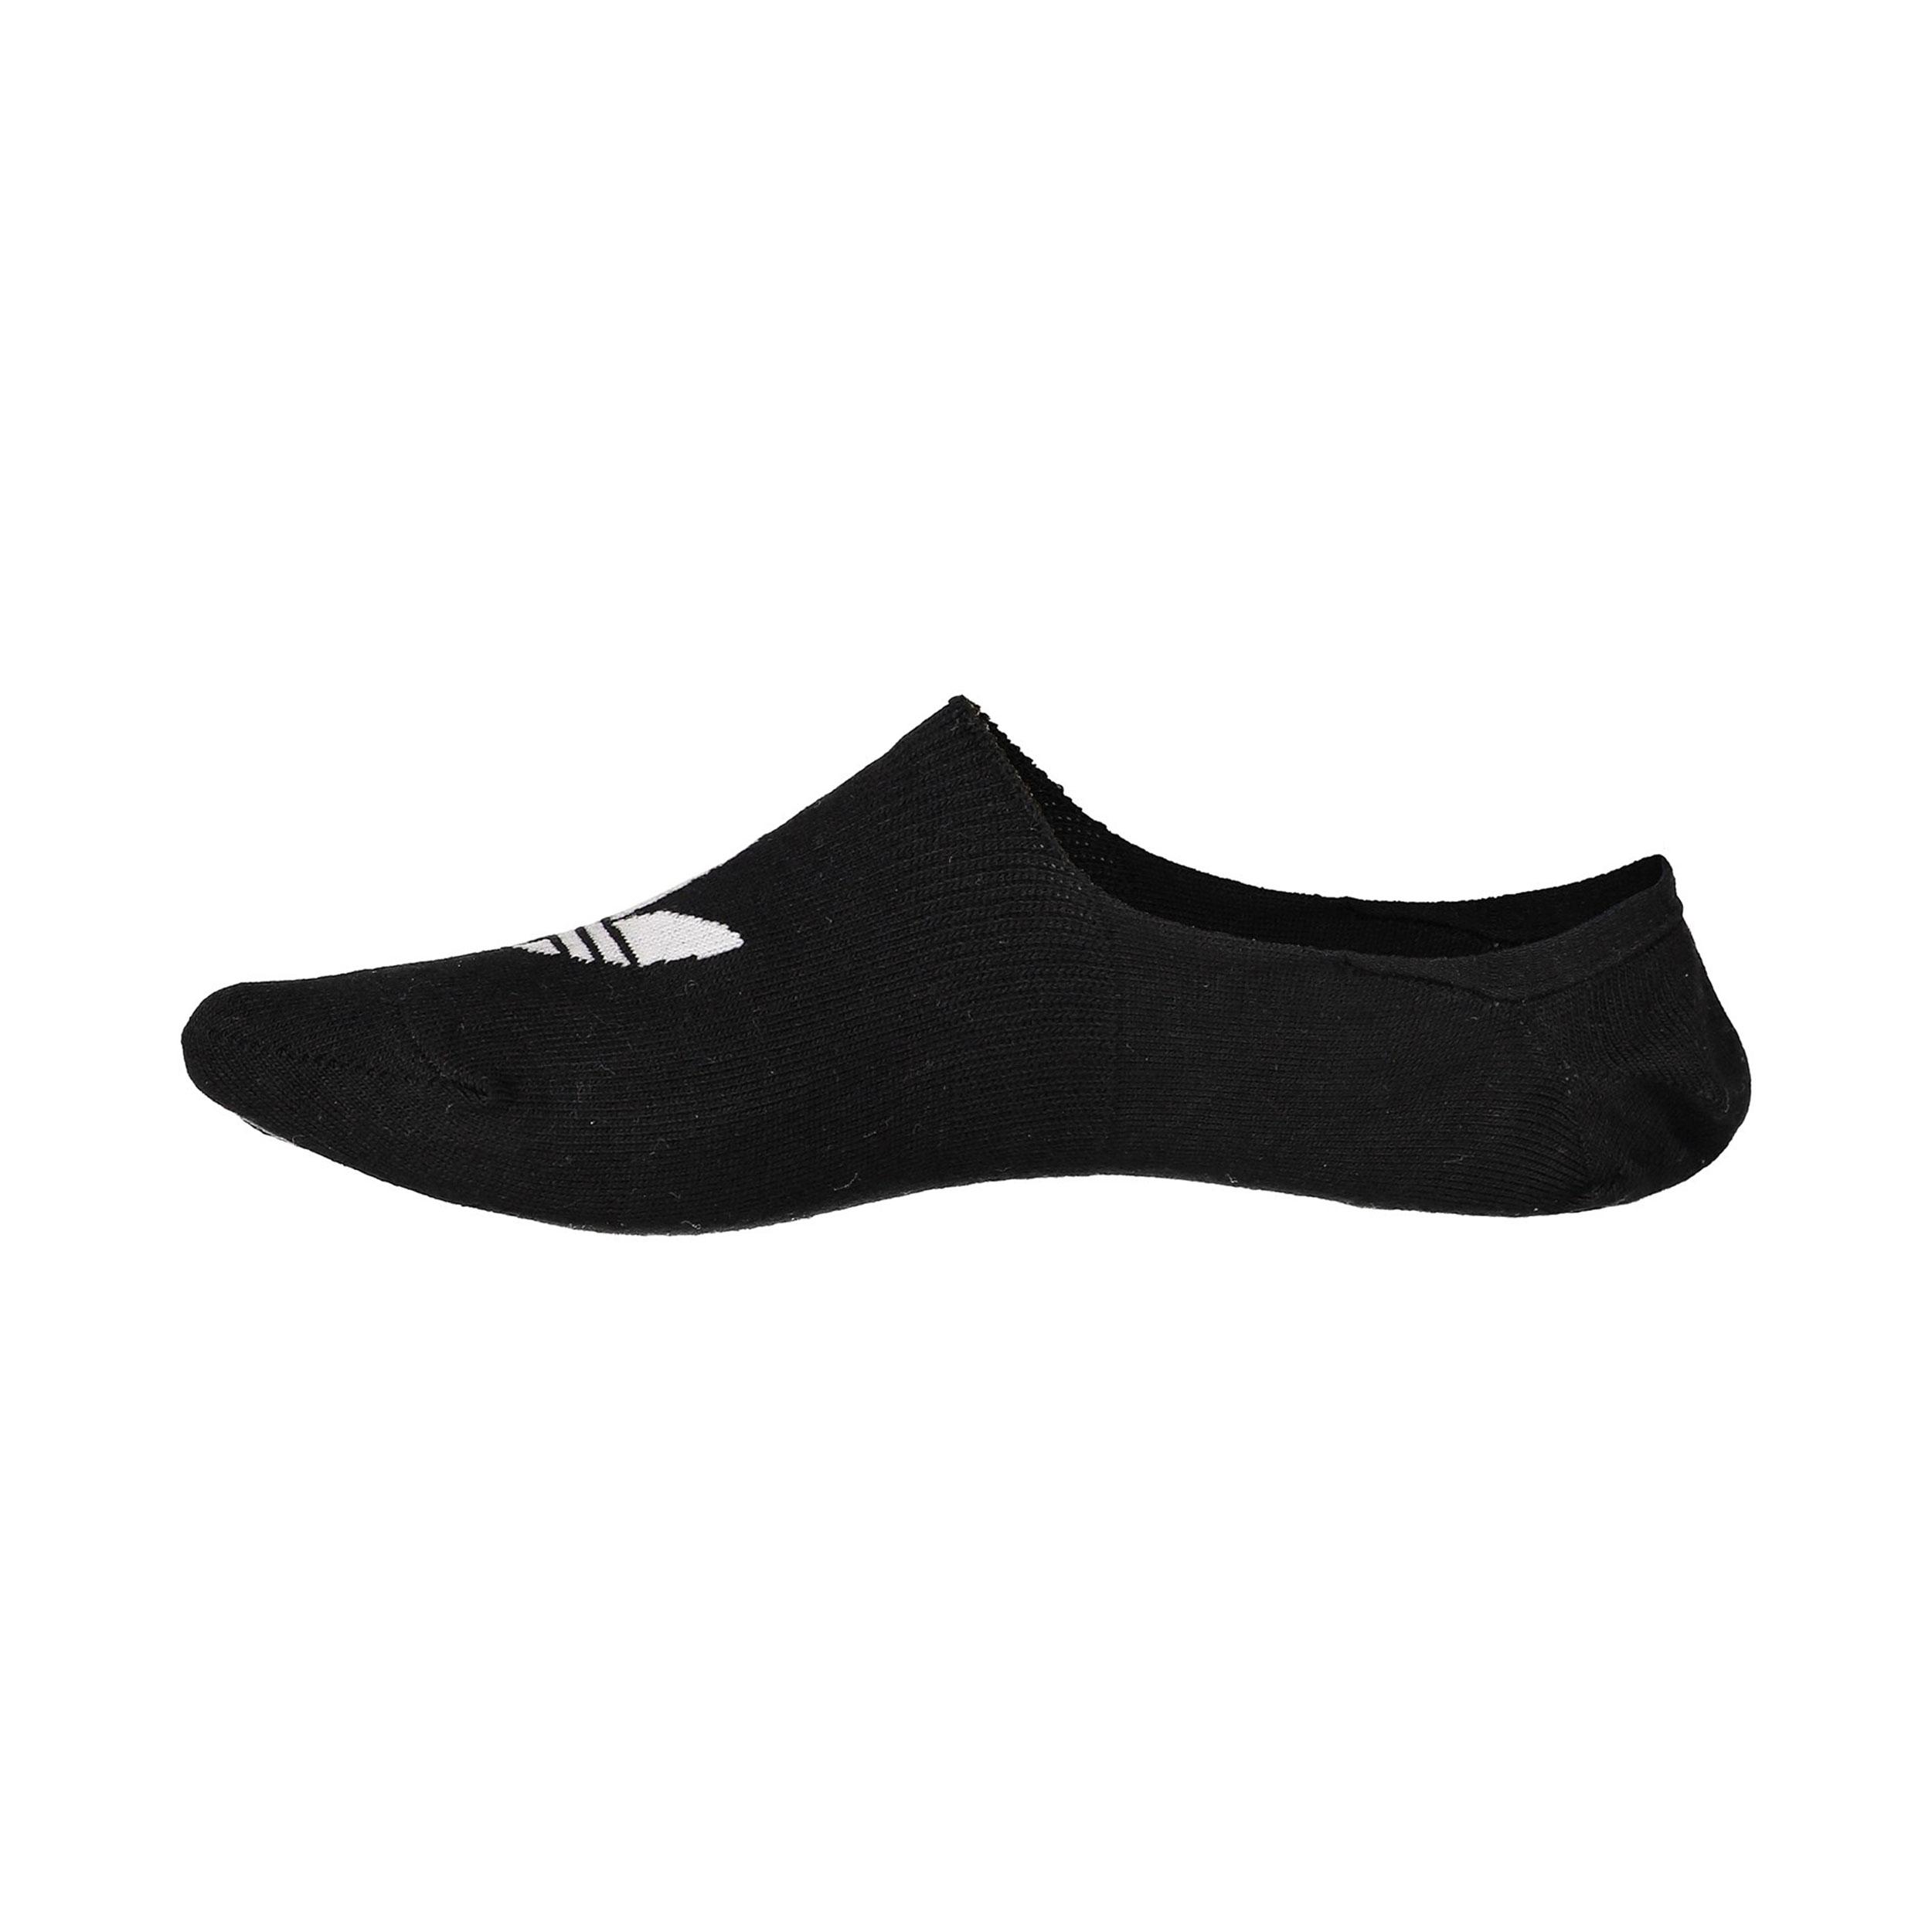 جوراب کفی زنانه Sneaker Invisible - آدیداس